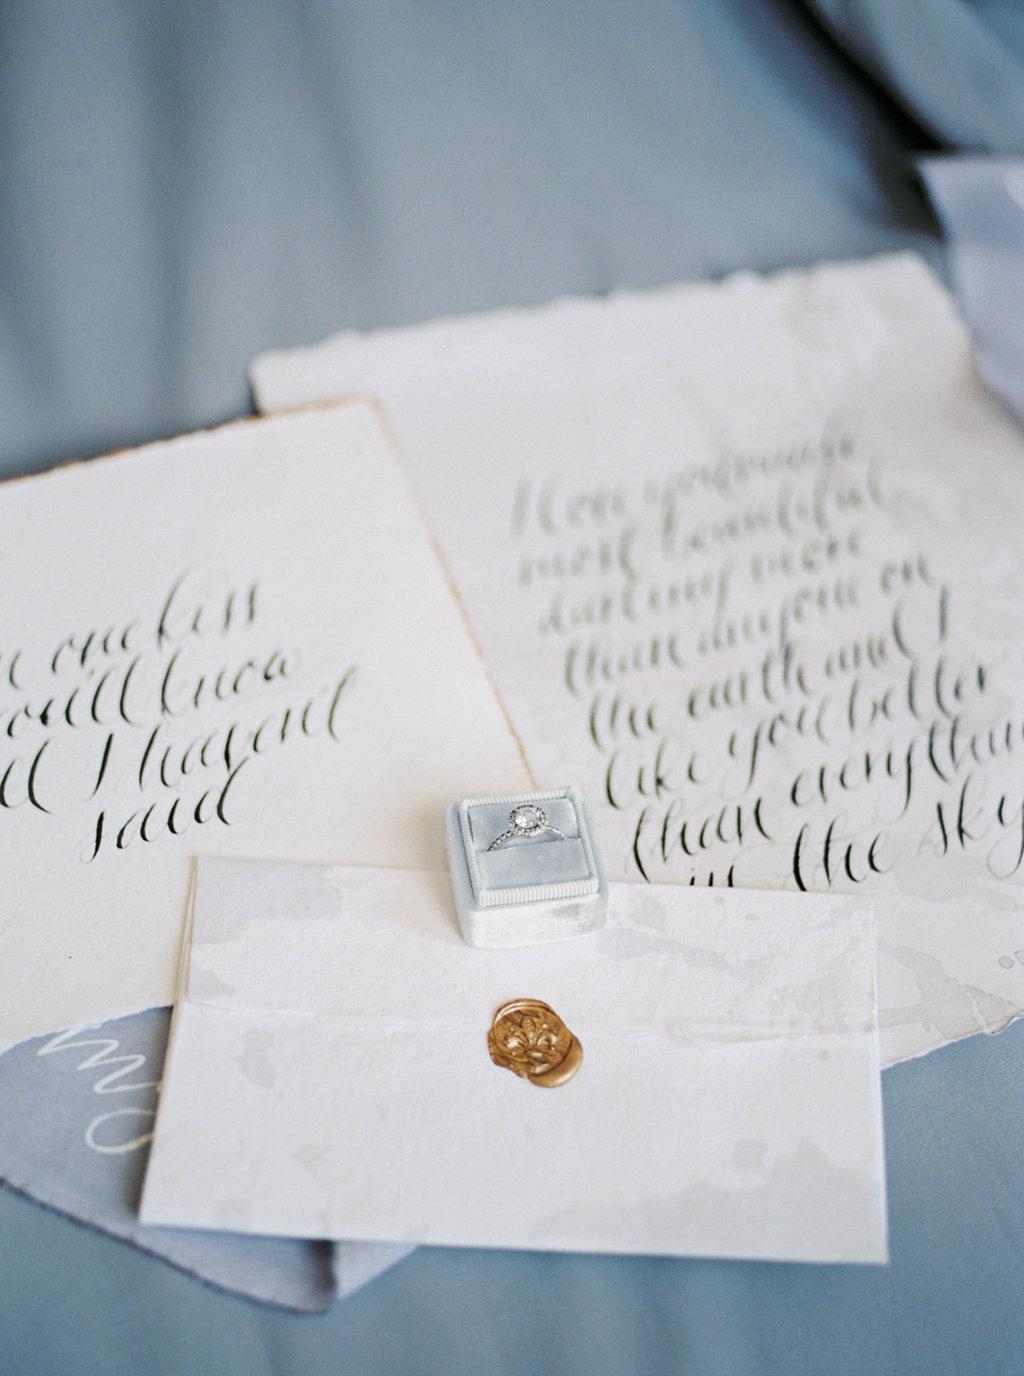 kayla-yestal-photography-vineyard-bride-swish-list-beamer-falls-manor-grimsby-engagement-9.jpg